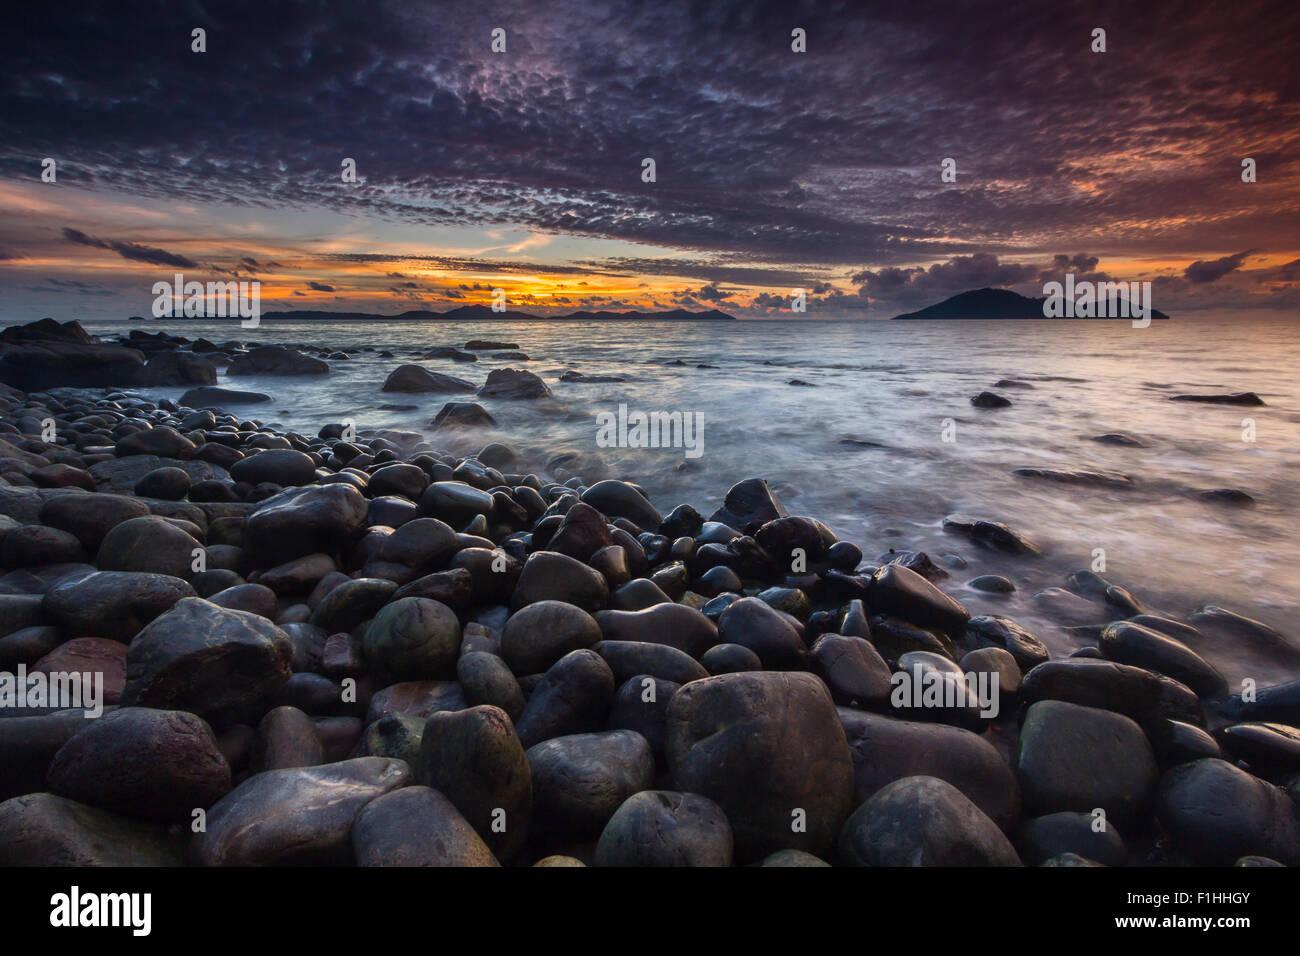 Sunset at a coast near Batu Payung Beach, West Kalimantan, Indonesia - Stock Image